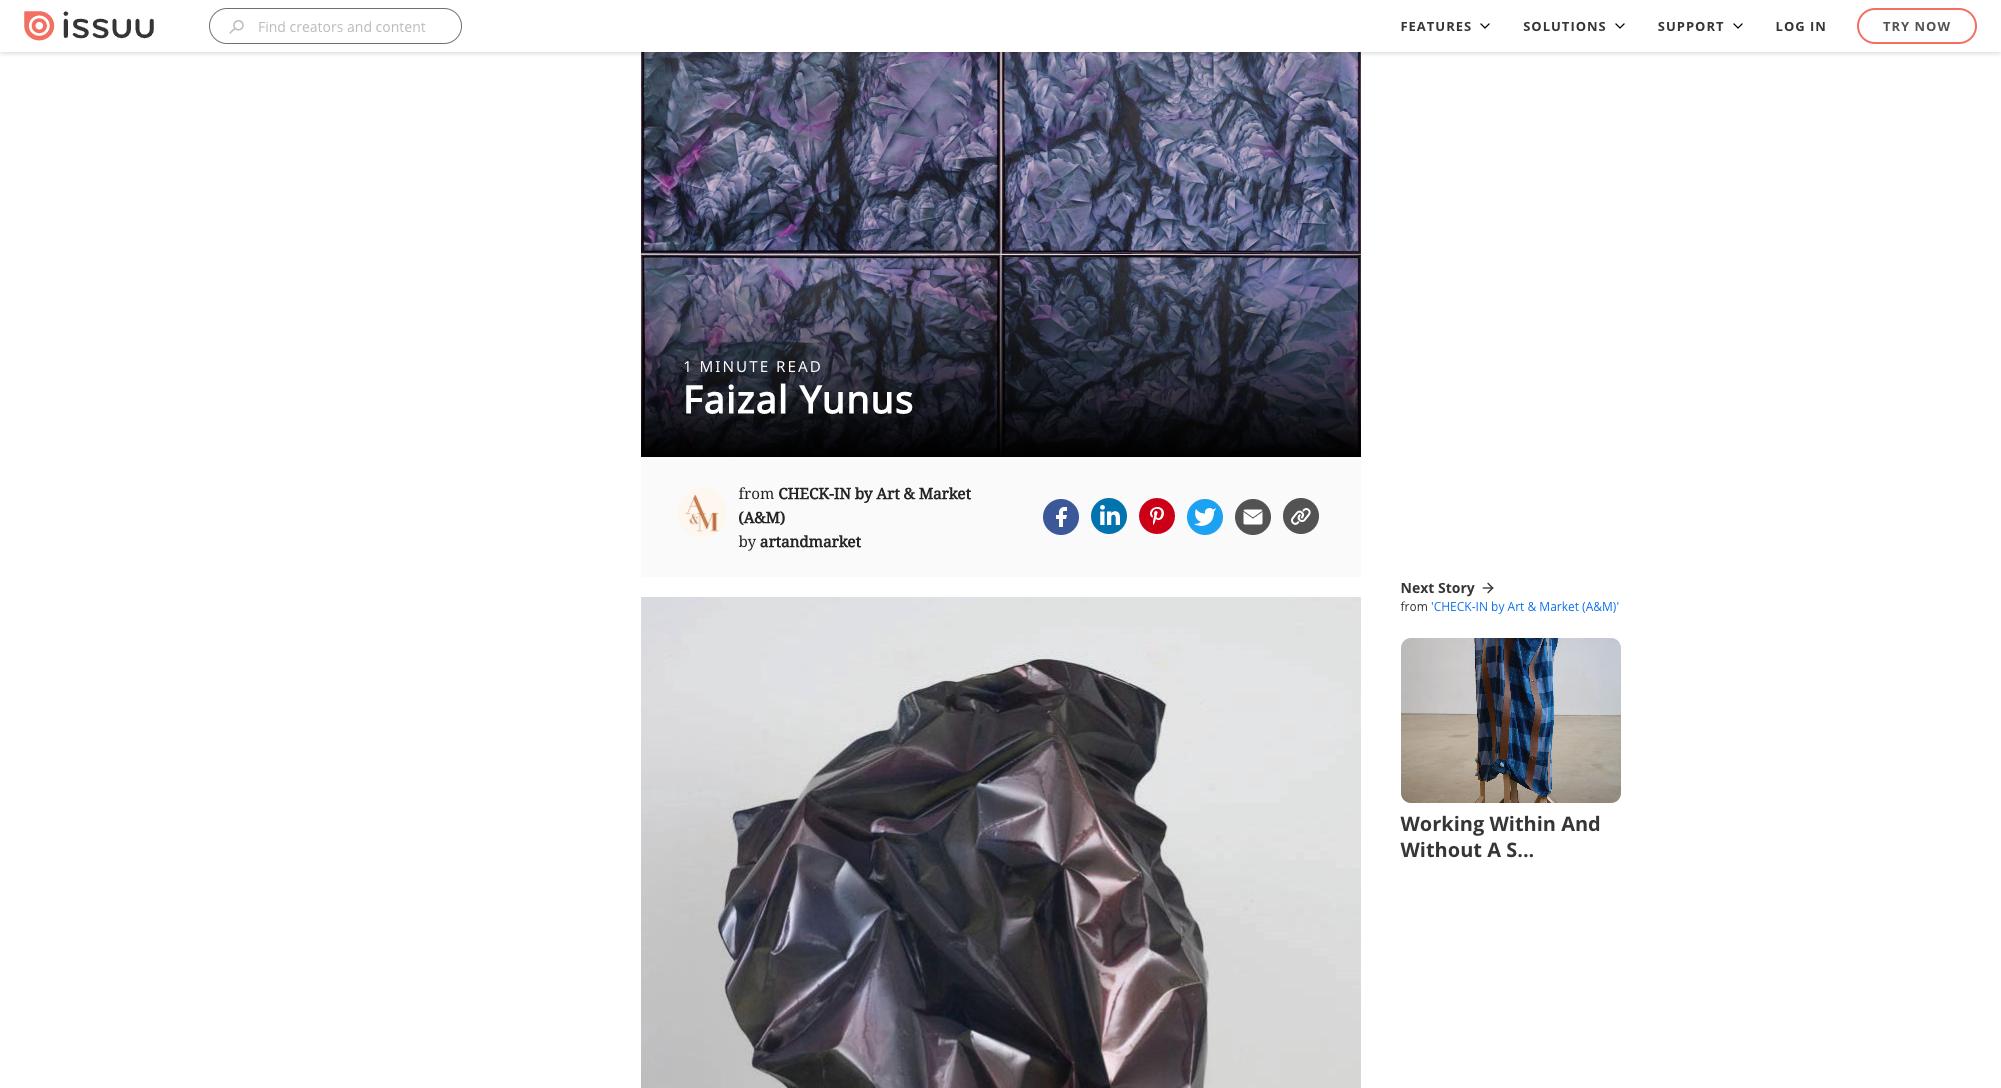 ISSUU (by Art&Market): Fresh Faces – Faizal Yunus